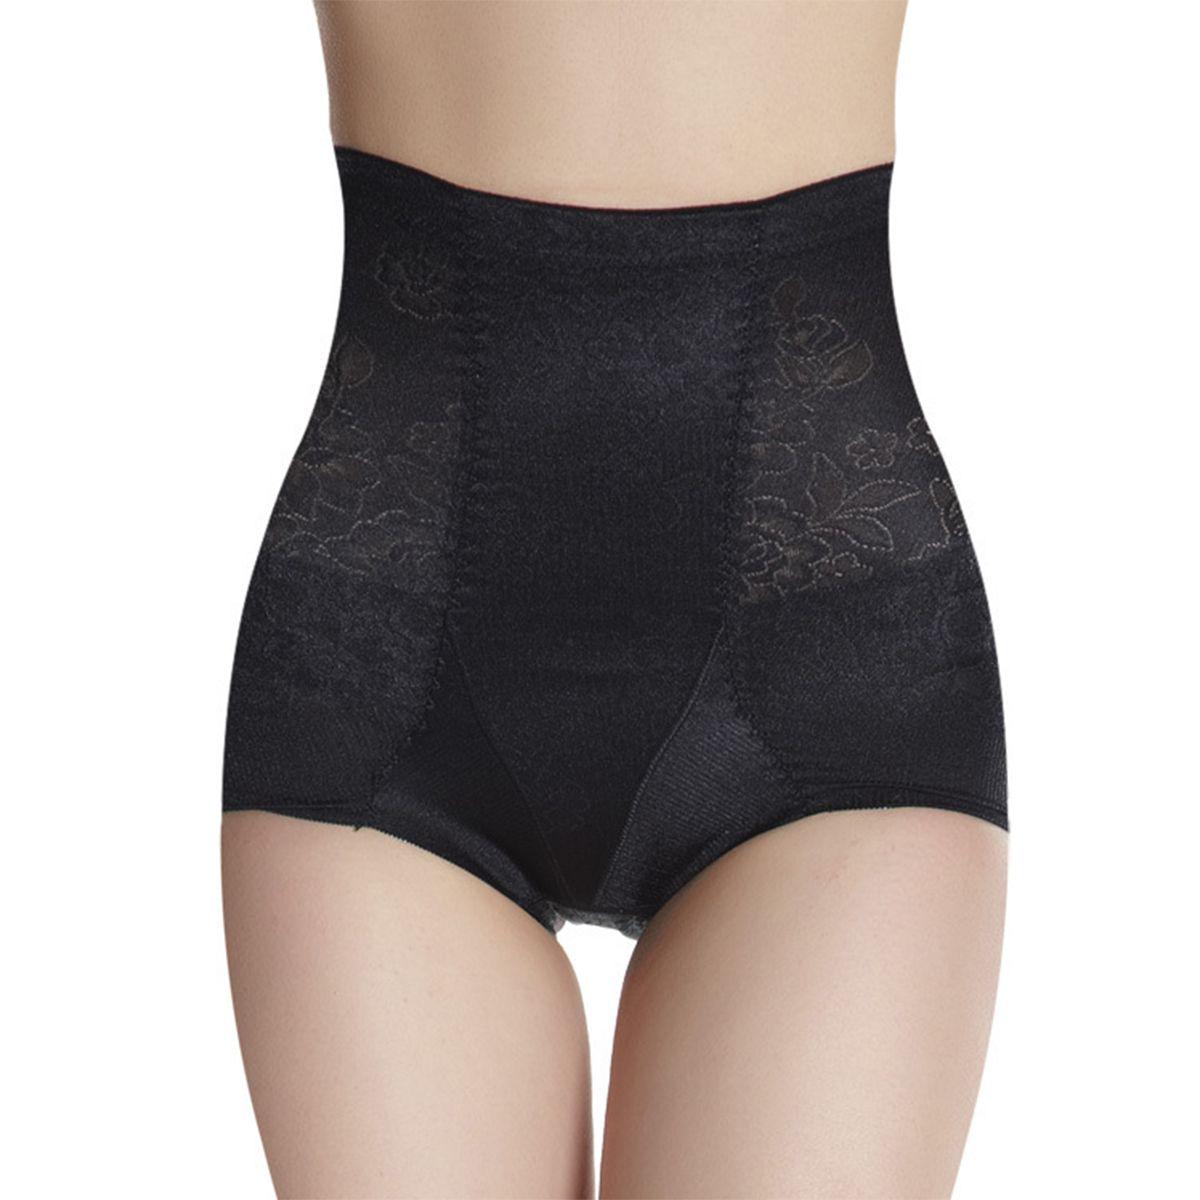 all Panties lingerie shapewear girdles